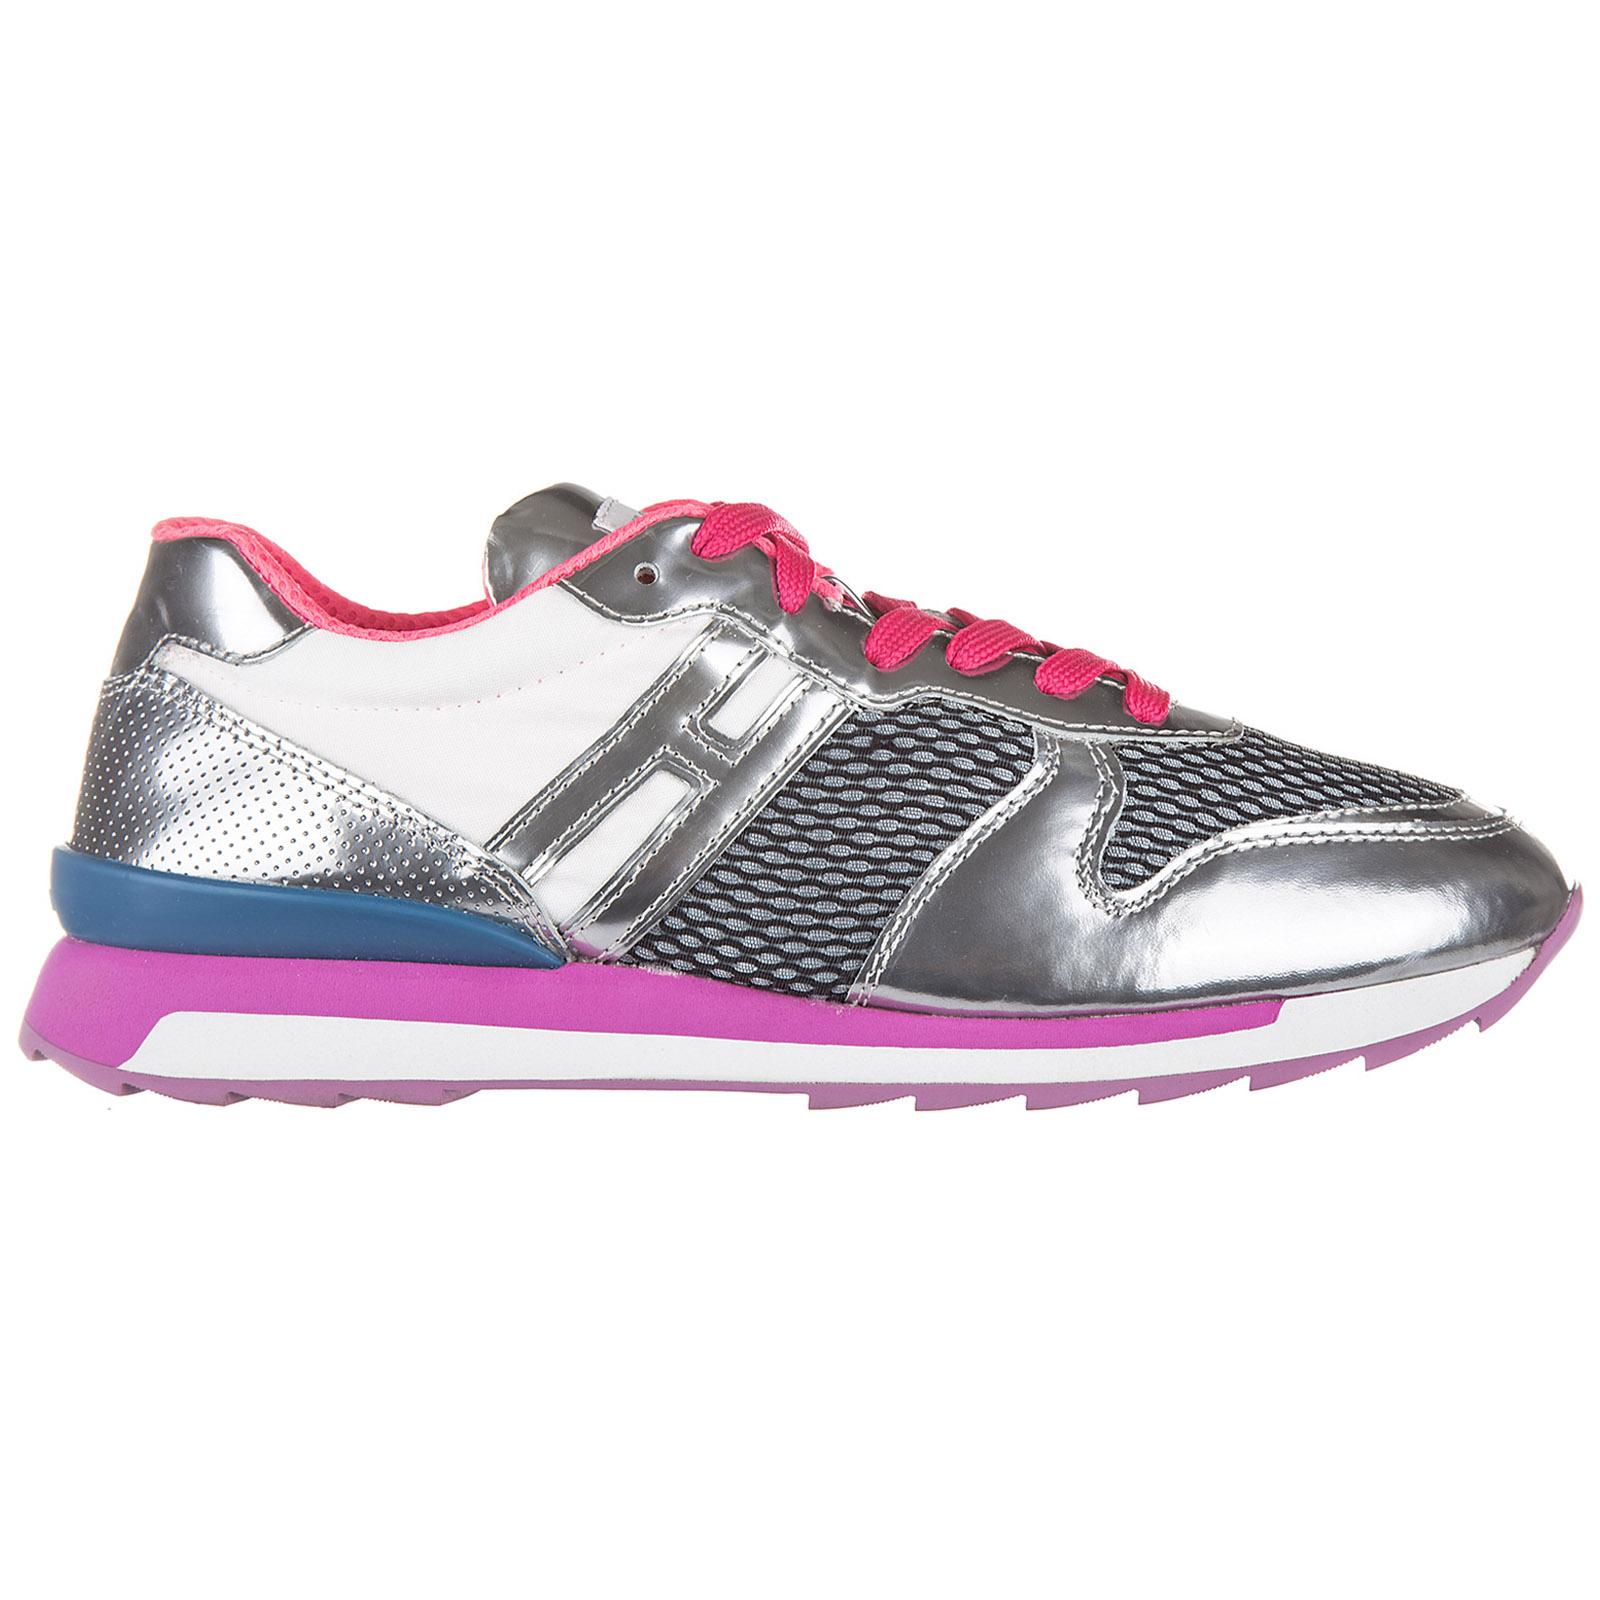 Sneakers Hogan Rebel Running - R261 HXW2610Q902CVK8844 glassé ... 3268db47a48